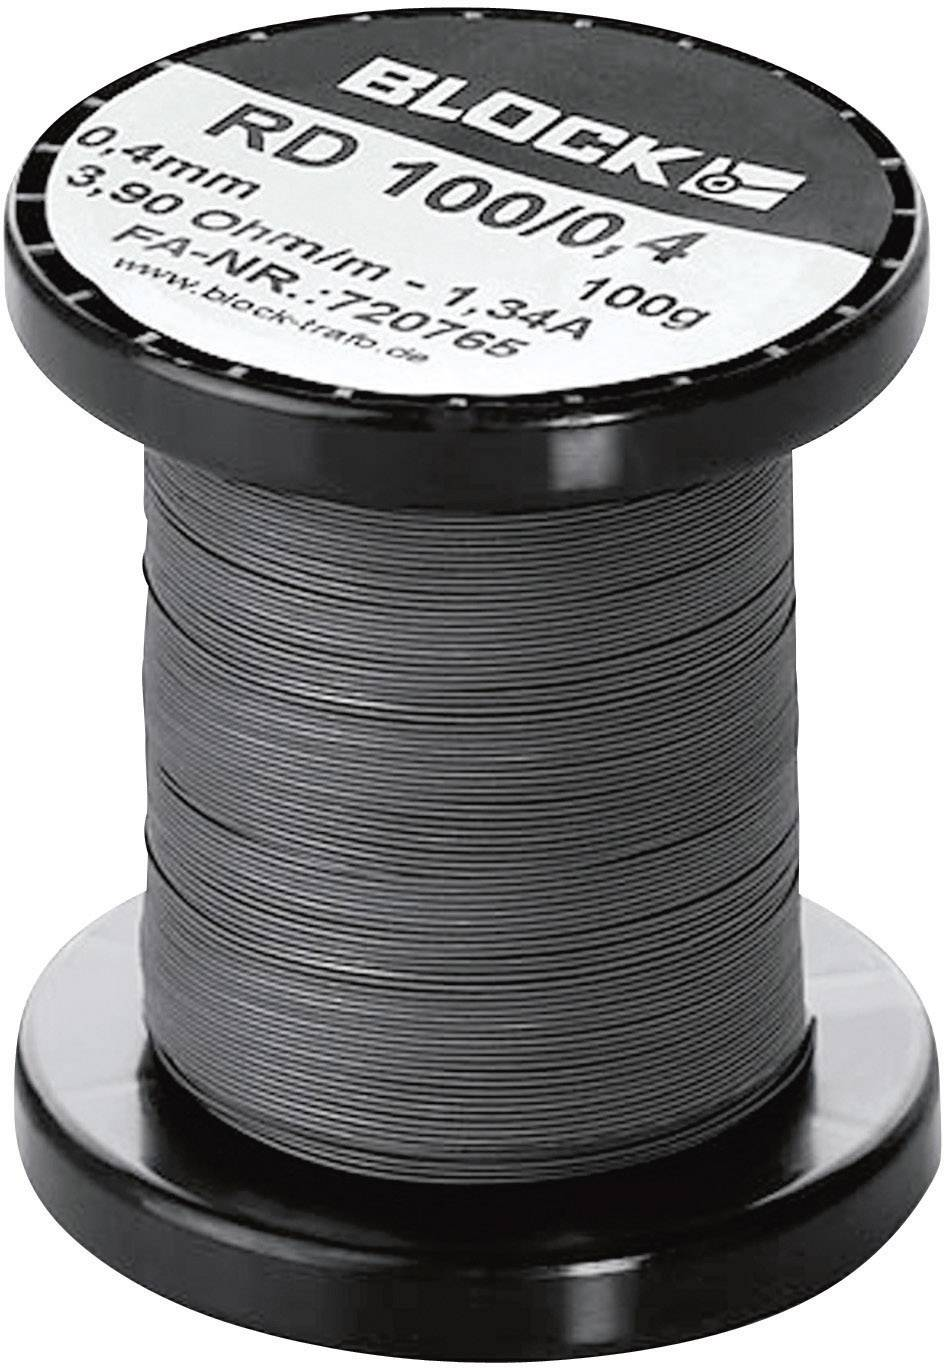 Odporový drát (konstantan) Block RD 100/0,1, 62.4 Ω/m, 1430 m